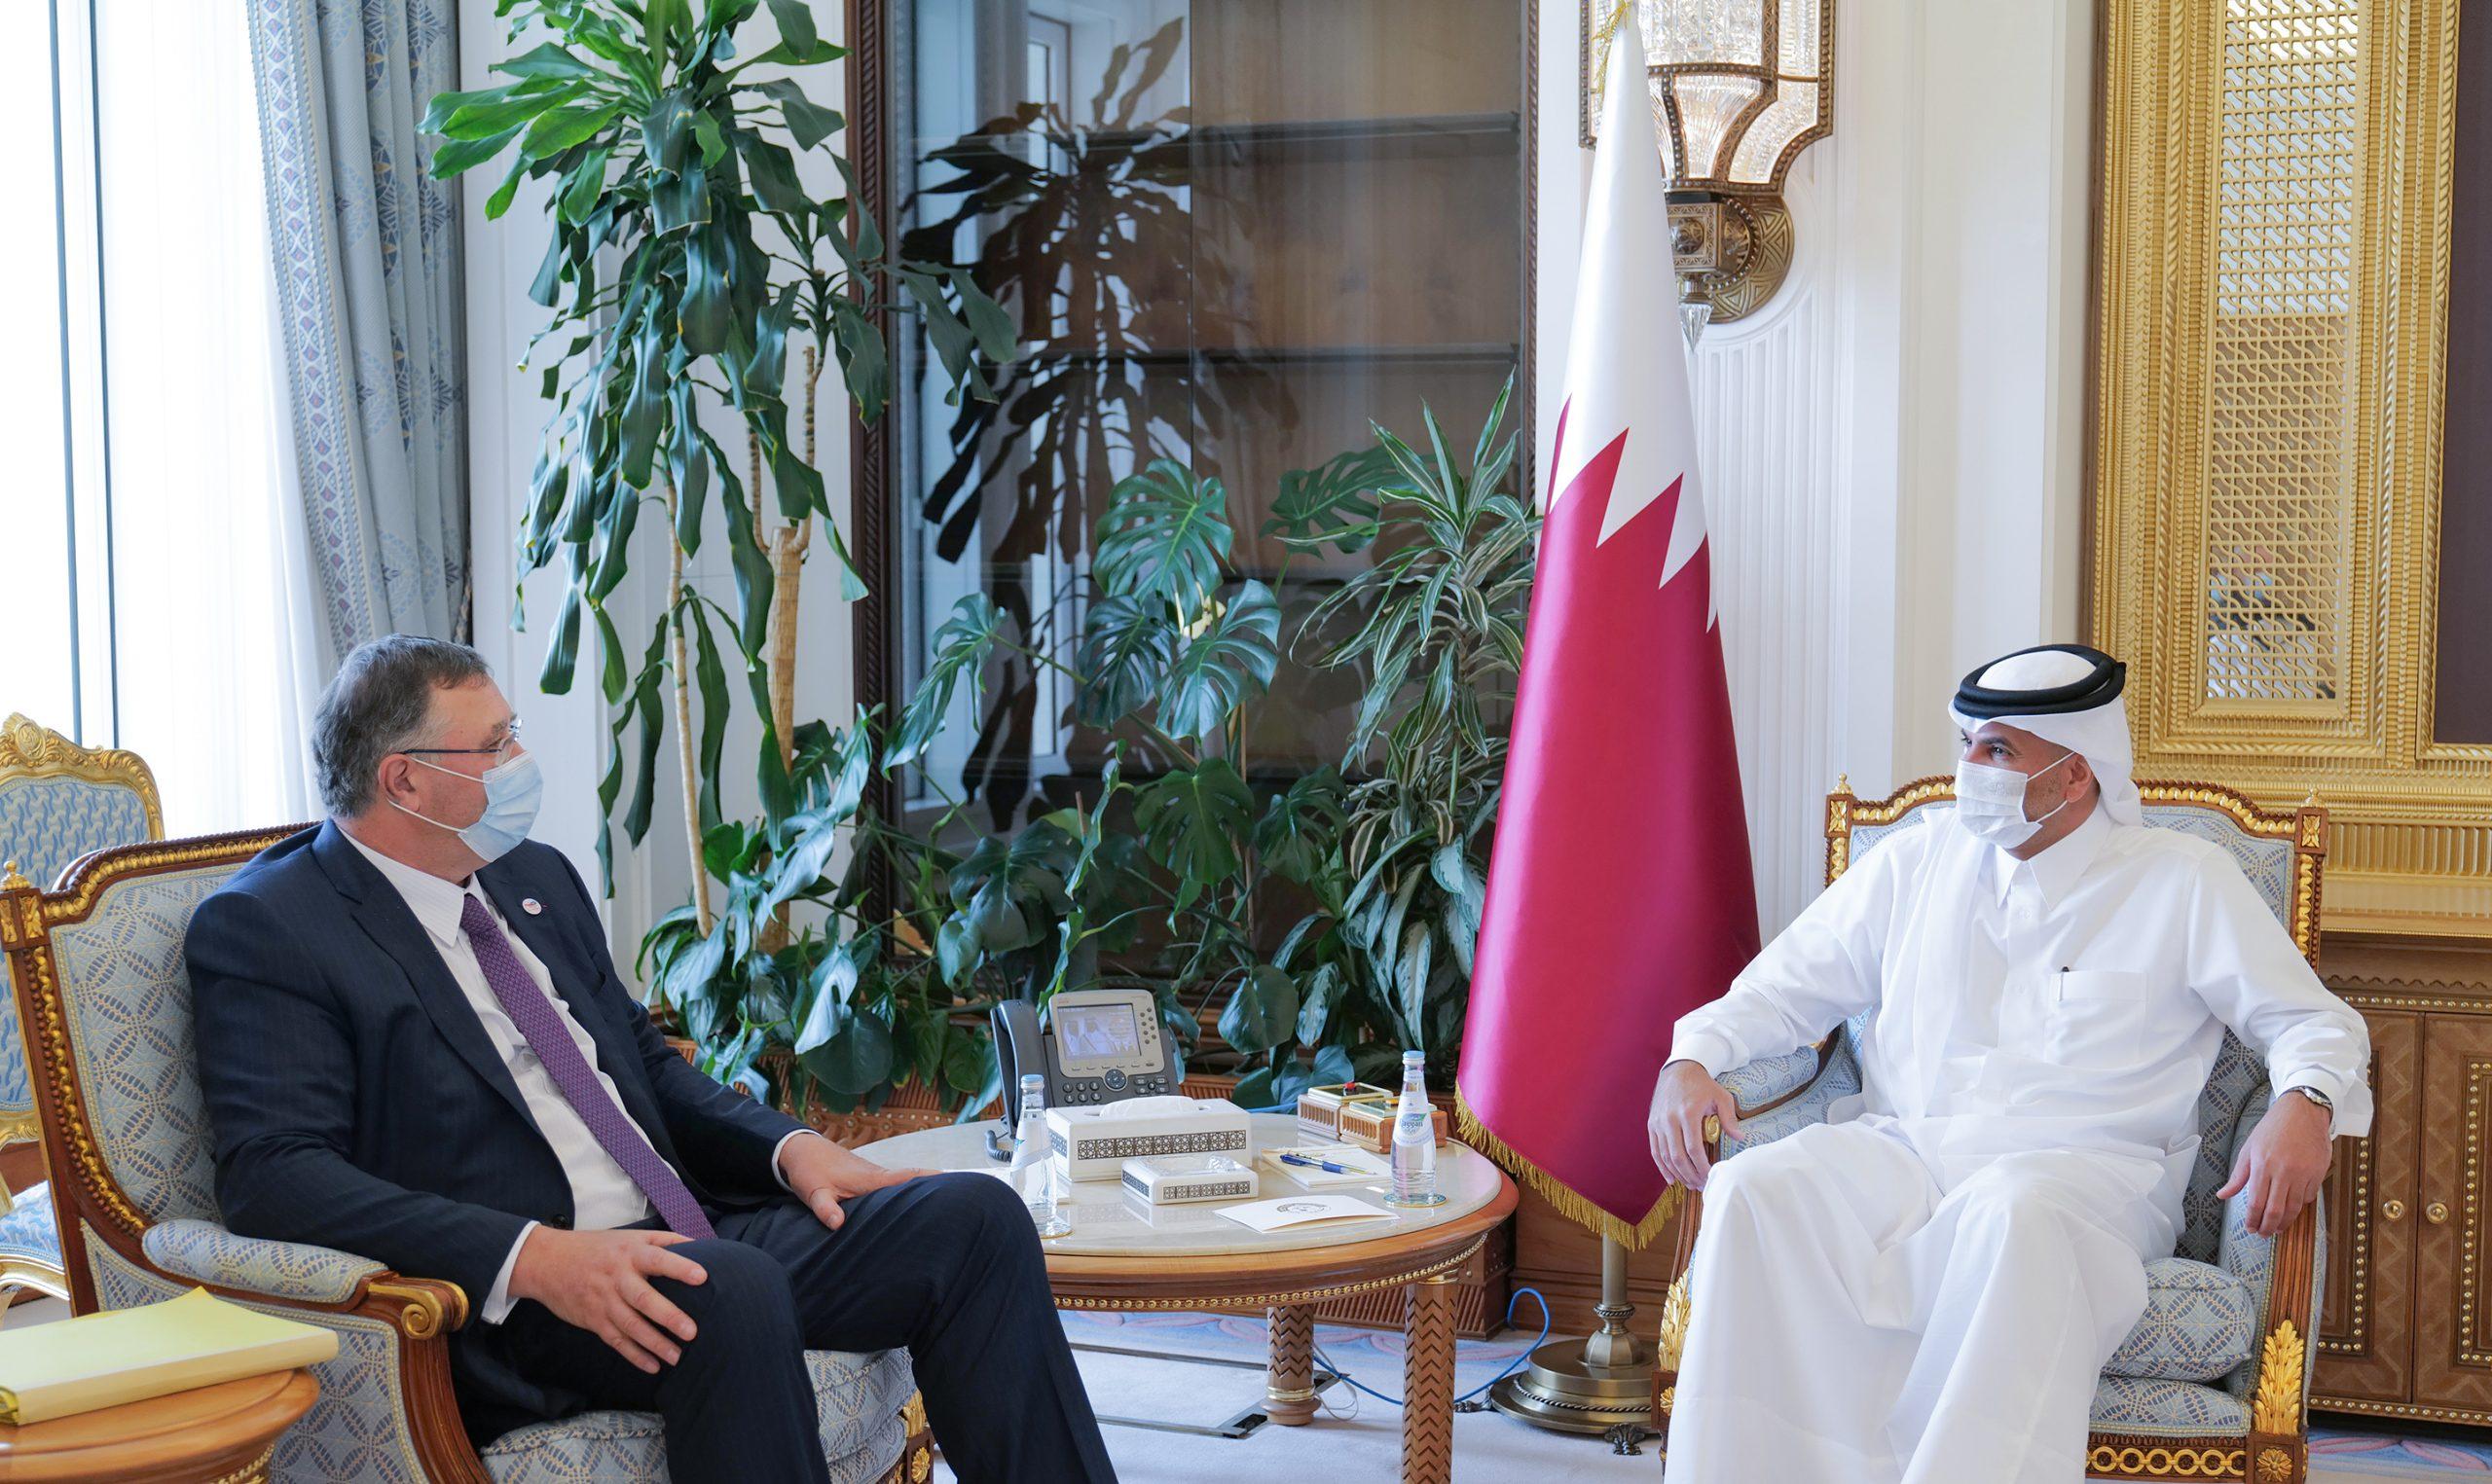 Prime Minister Meets Delegation Members of Qadran Association